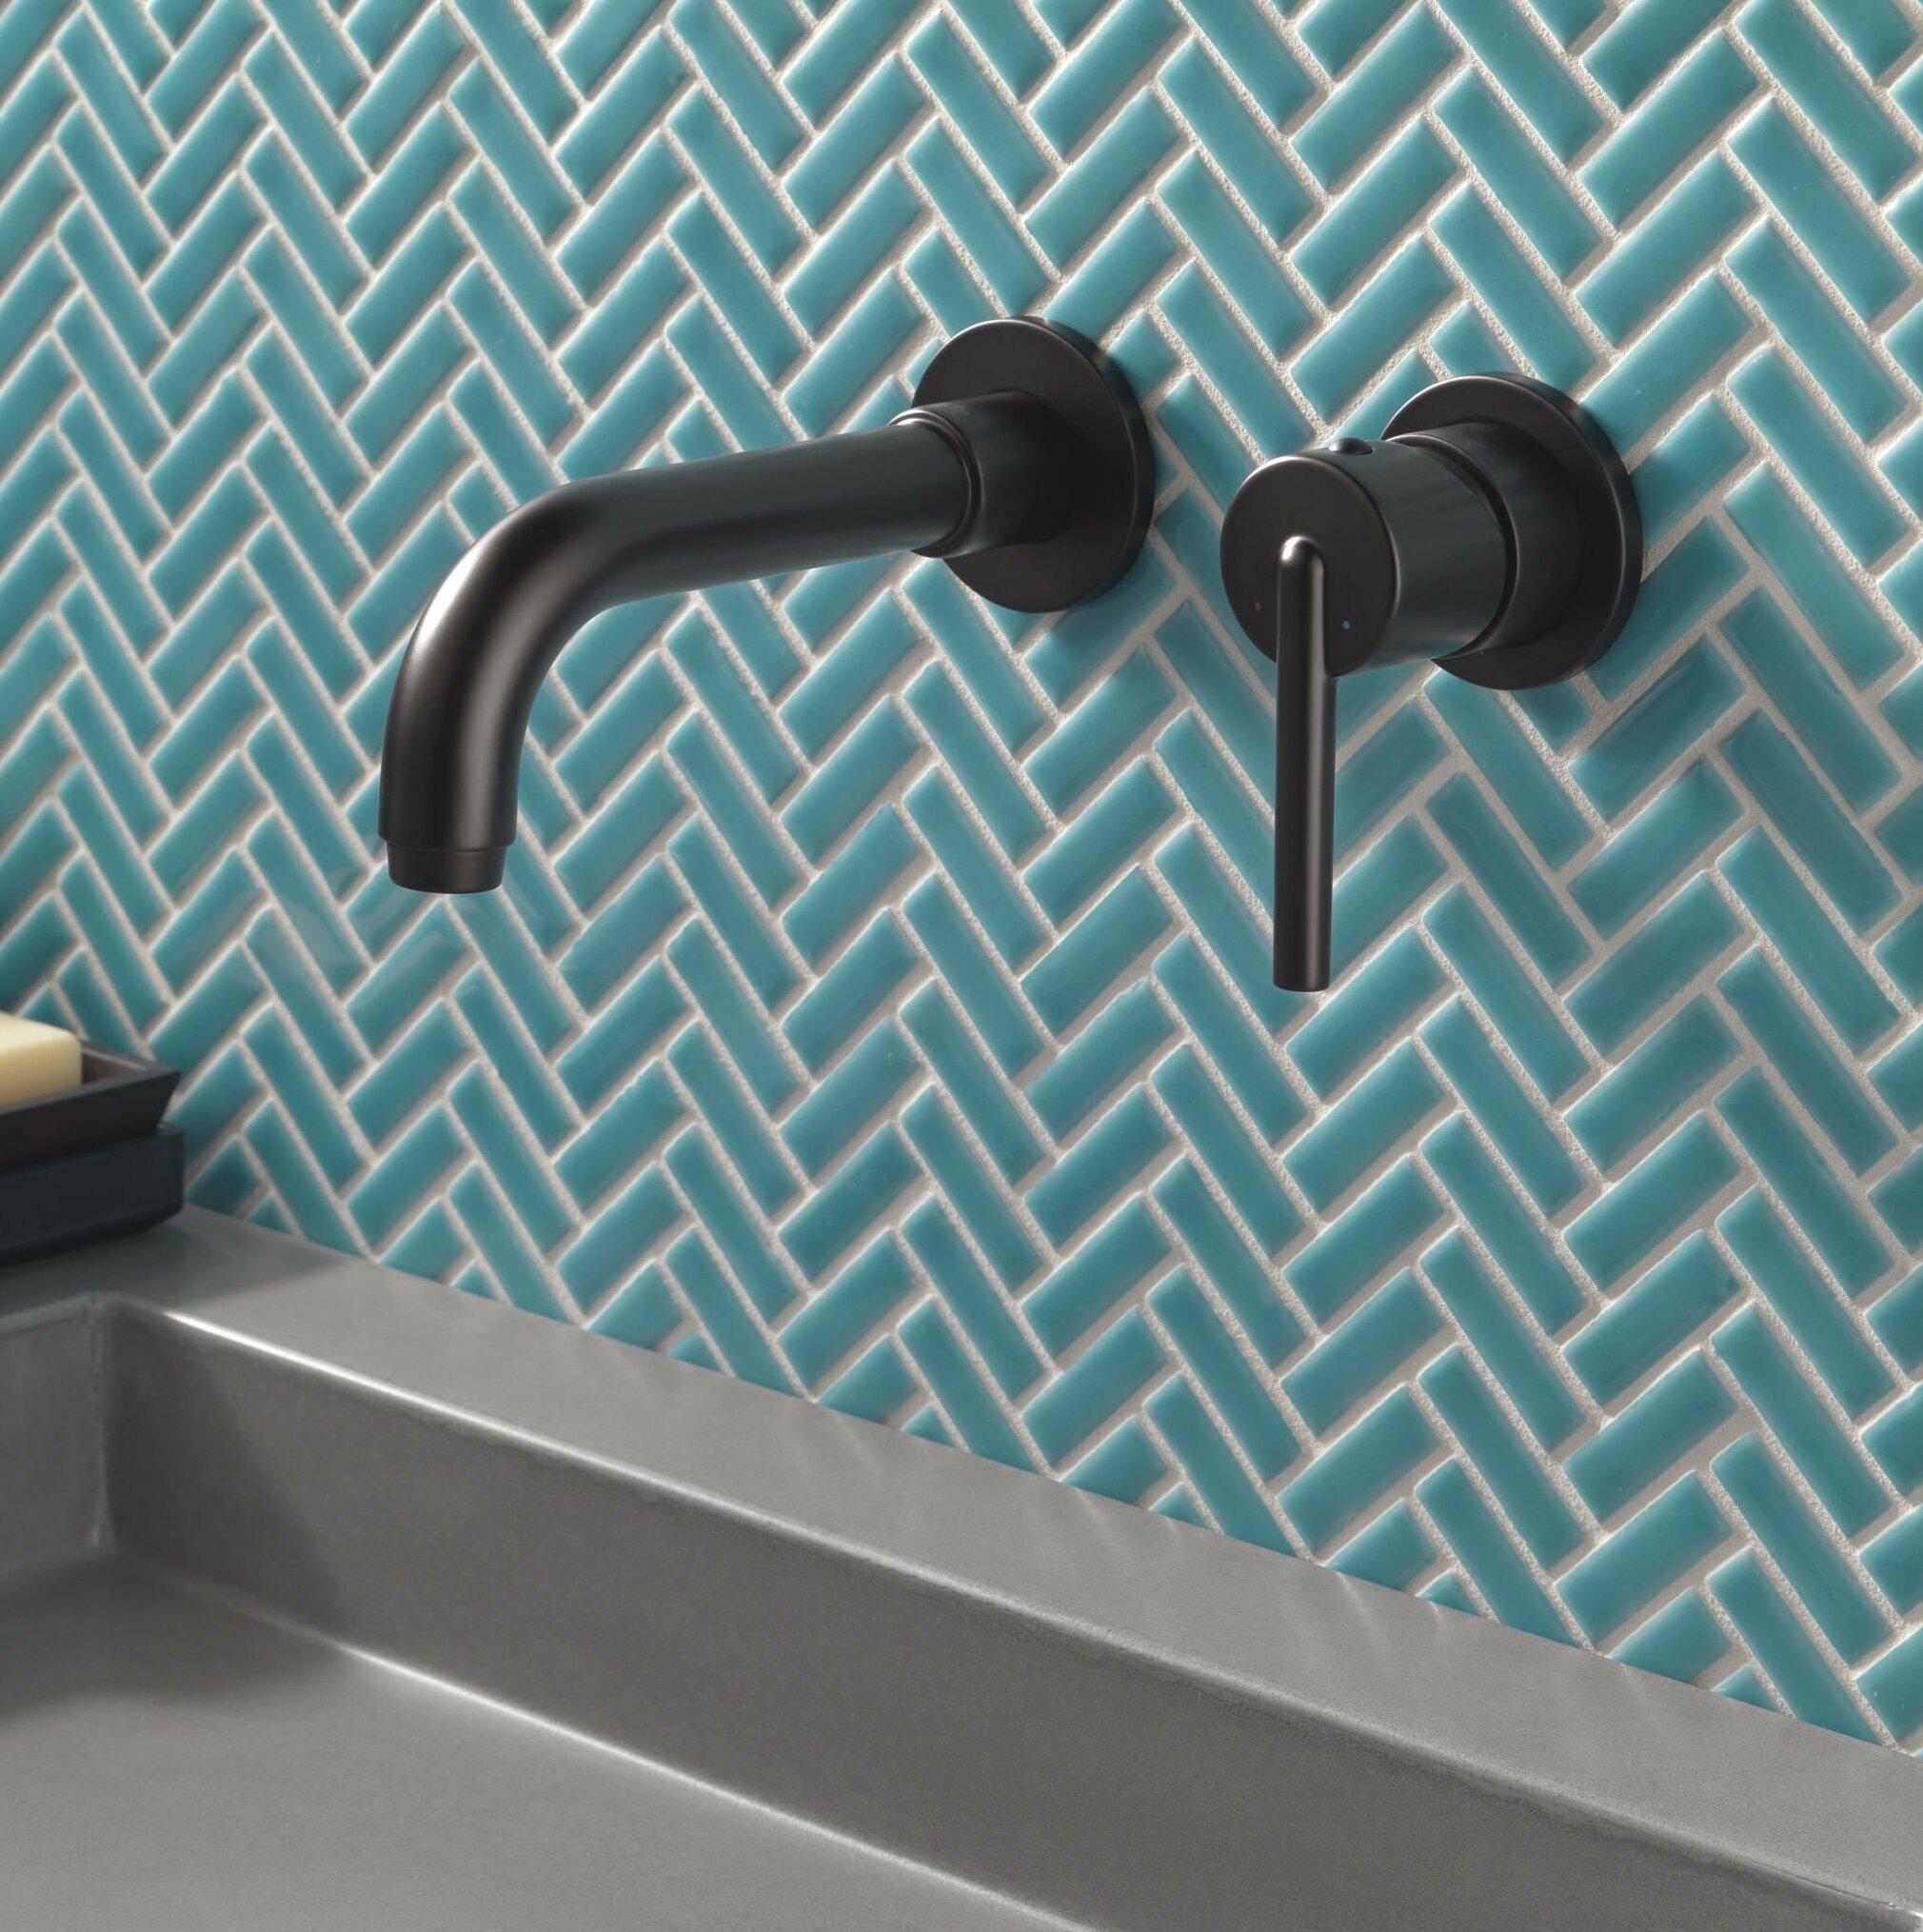 T3559lf Wl Czwl Blwl Delta Trinsic Wall Mounted Bathroom Faucet Reviews Wayfair